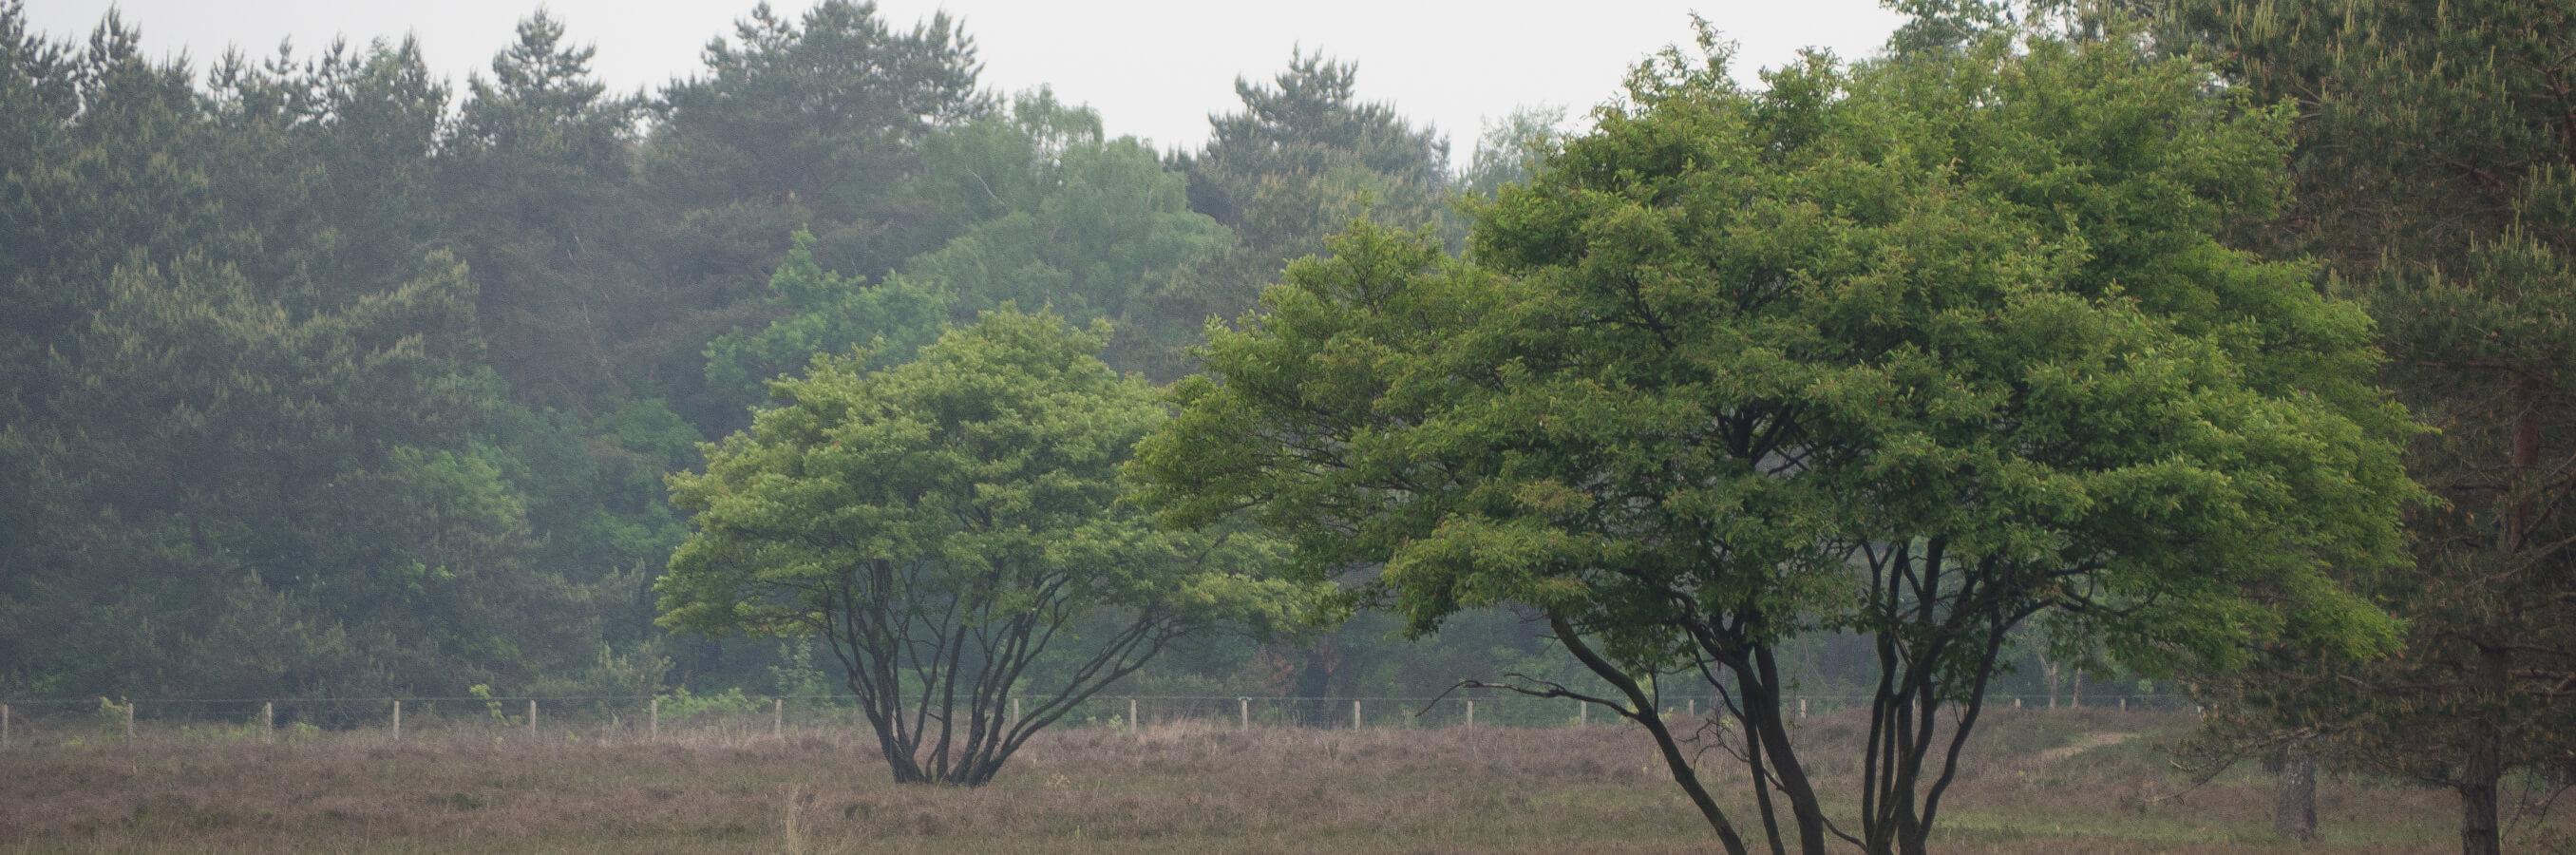 Heide Bussum krentenbomen nabij locatie mindfulnesstraining